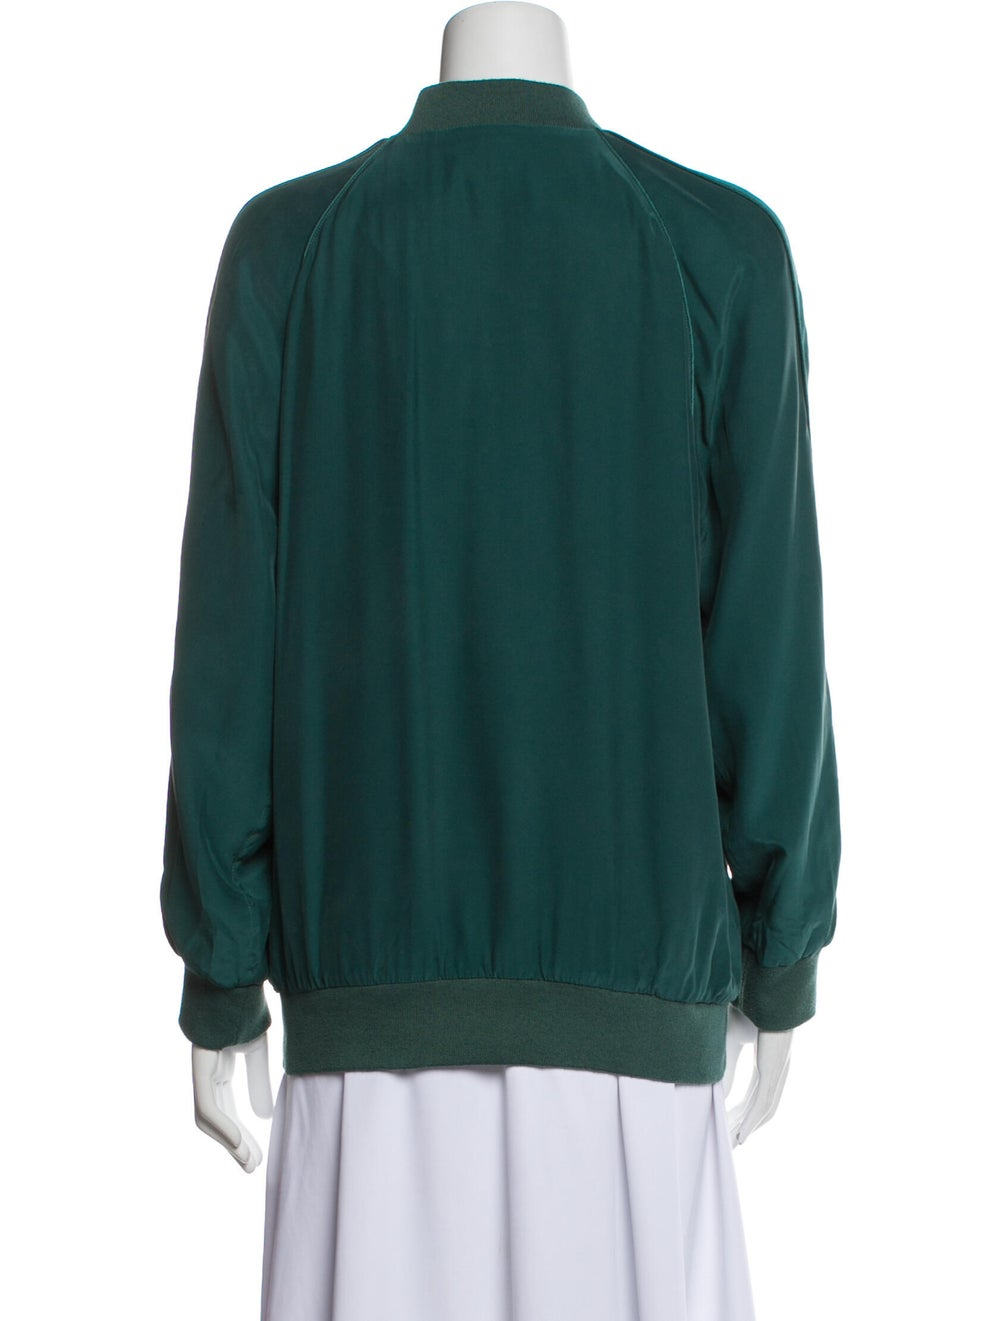 Equipment Silk Bomber Jacket Green - image 3